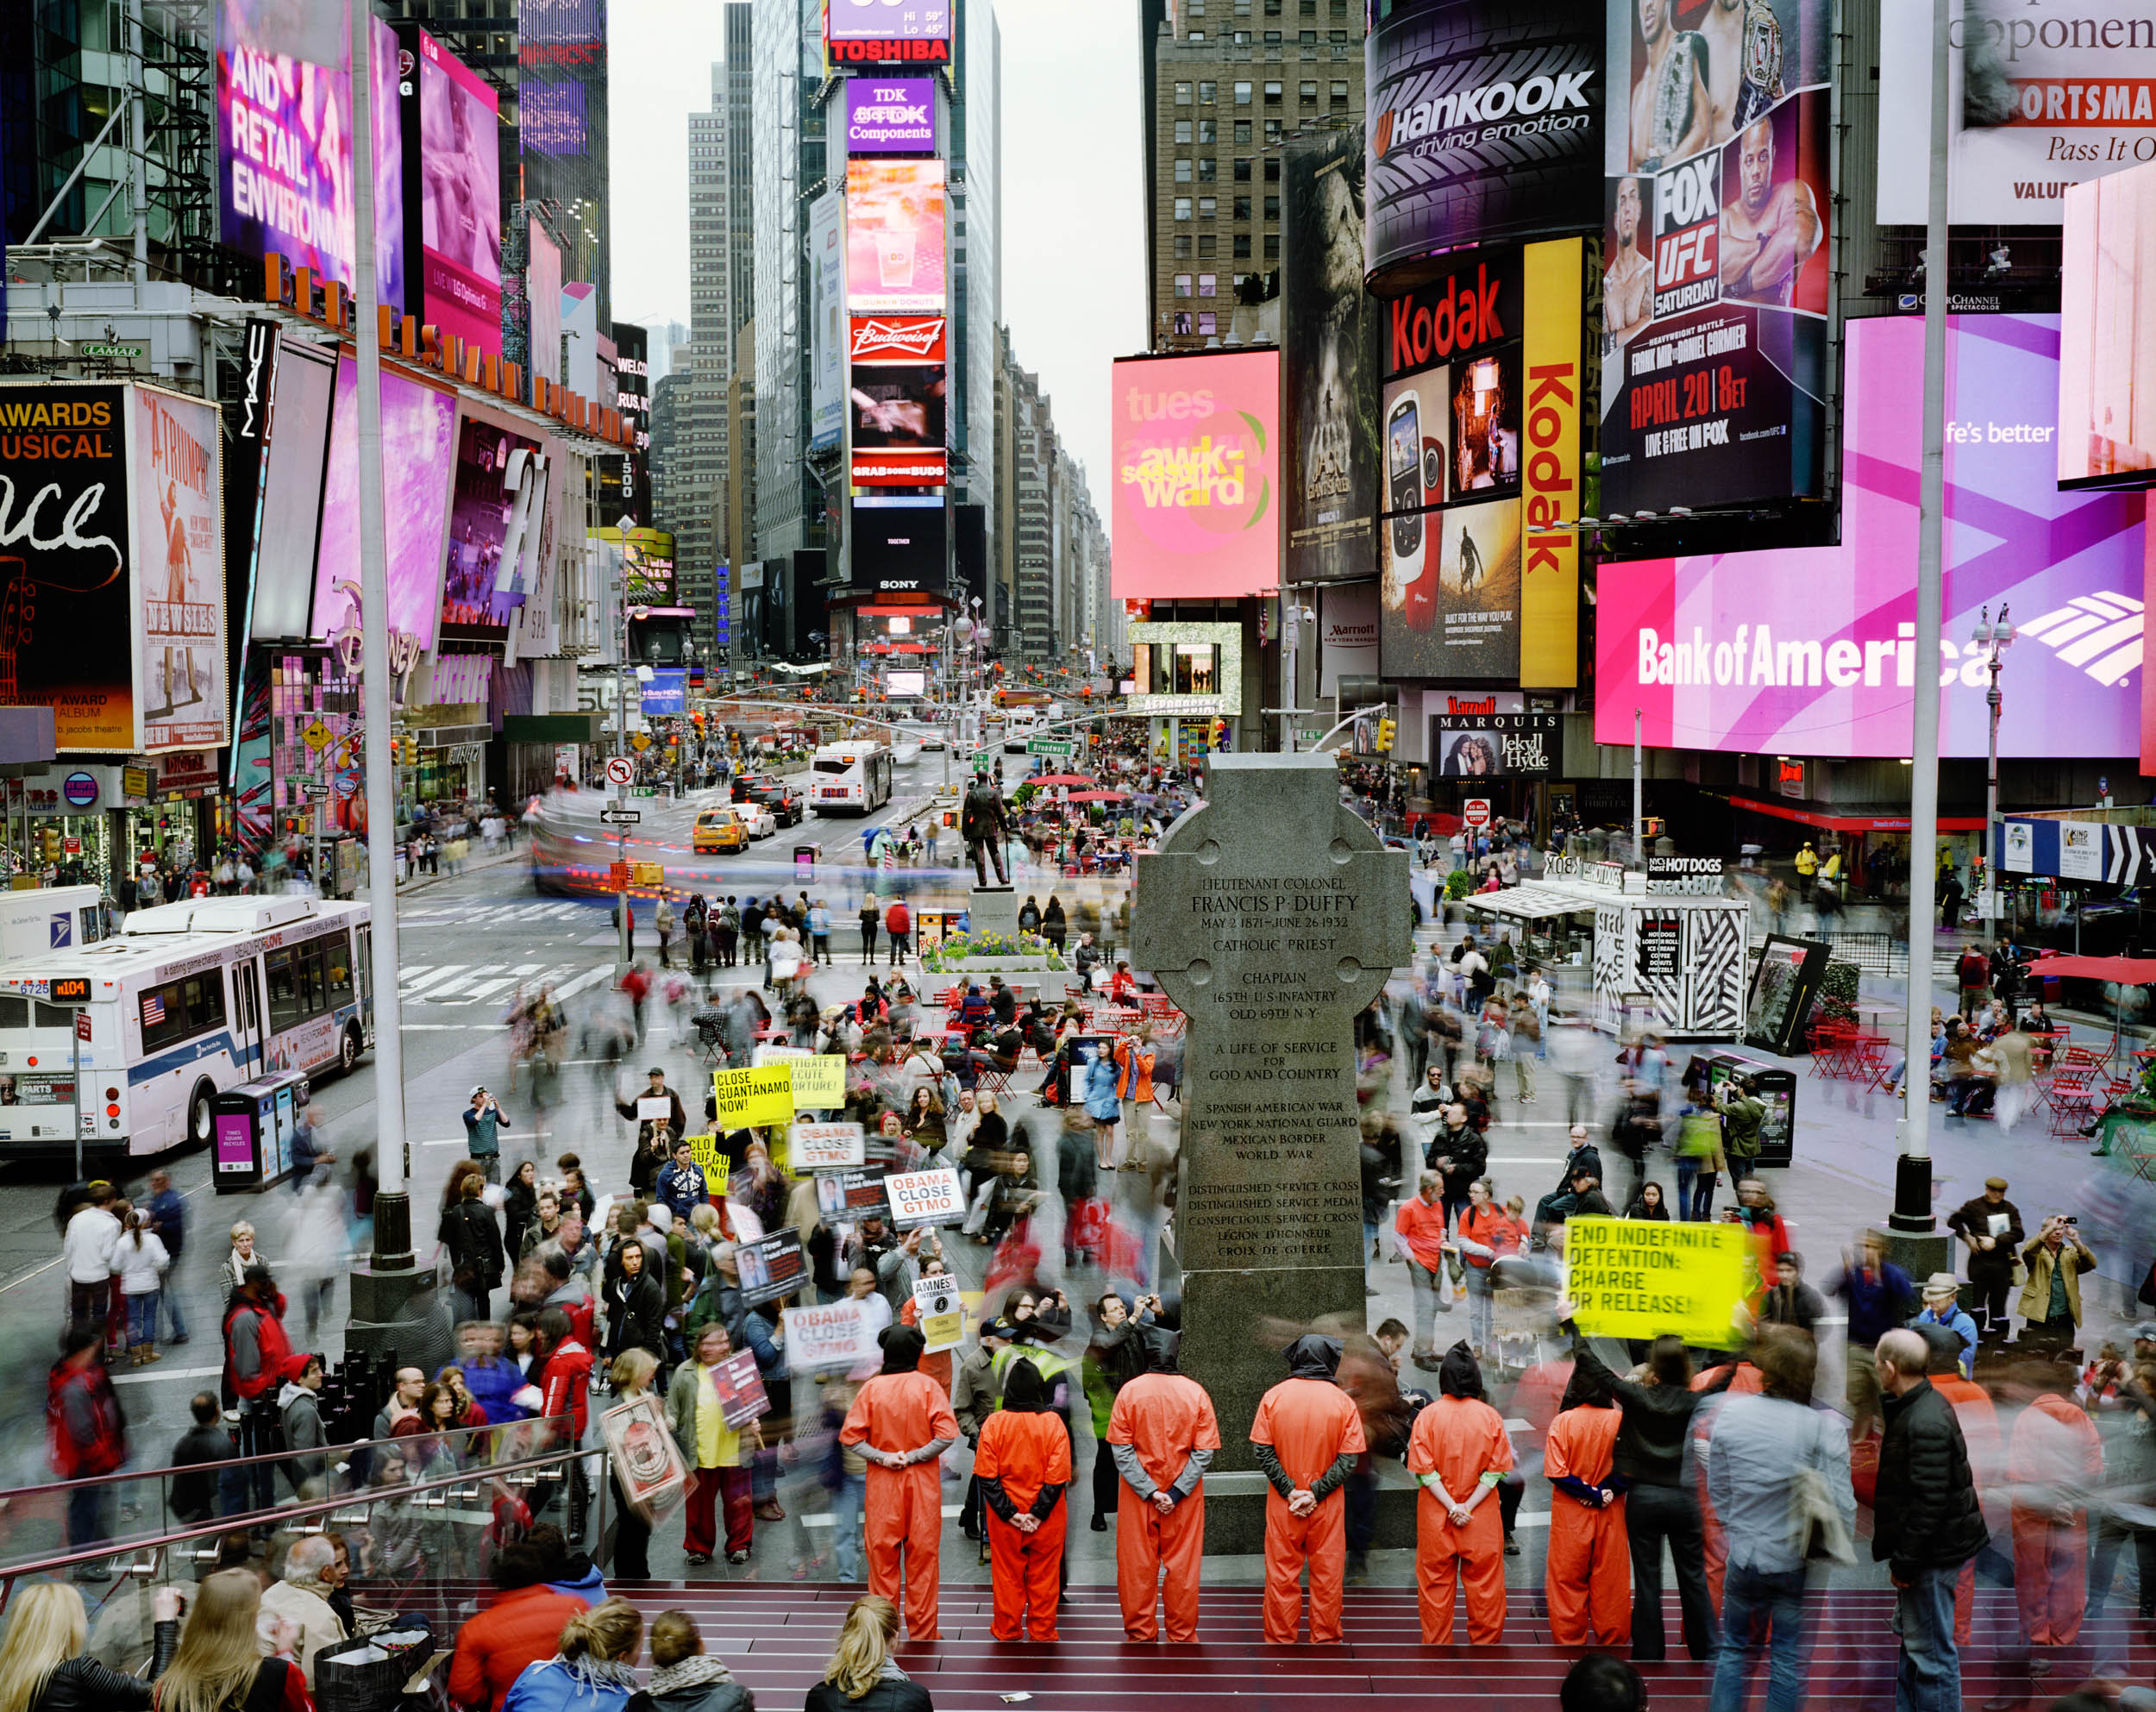 Times Square, Manhattan, New York, USA (Guantanamo Bay protest)